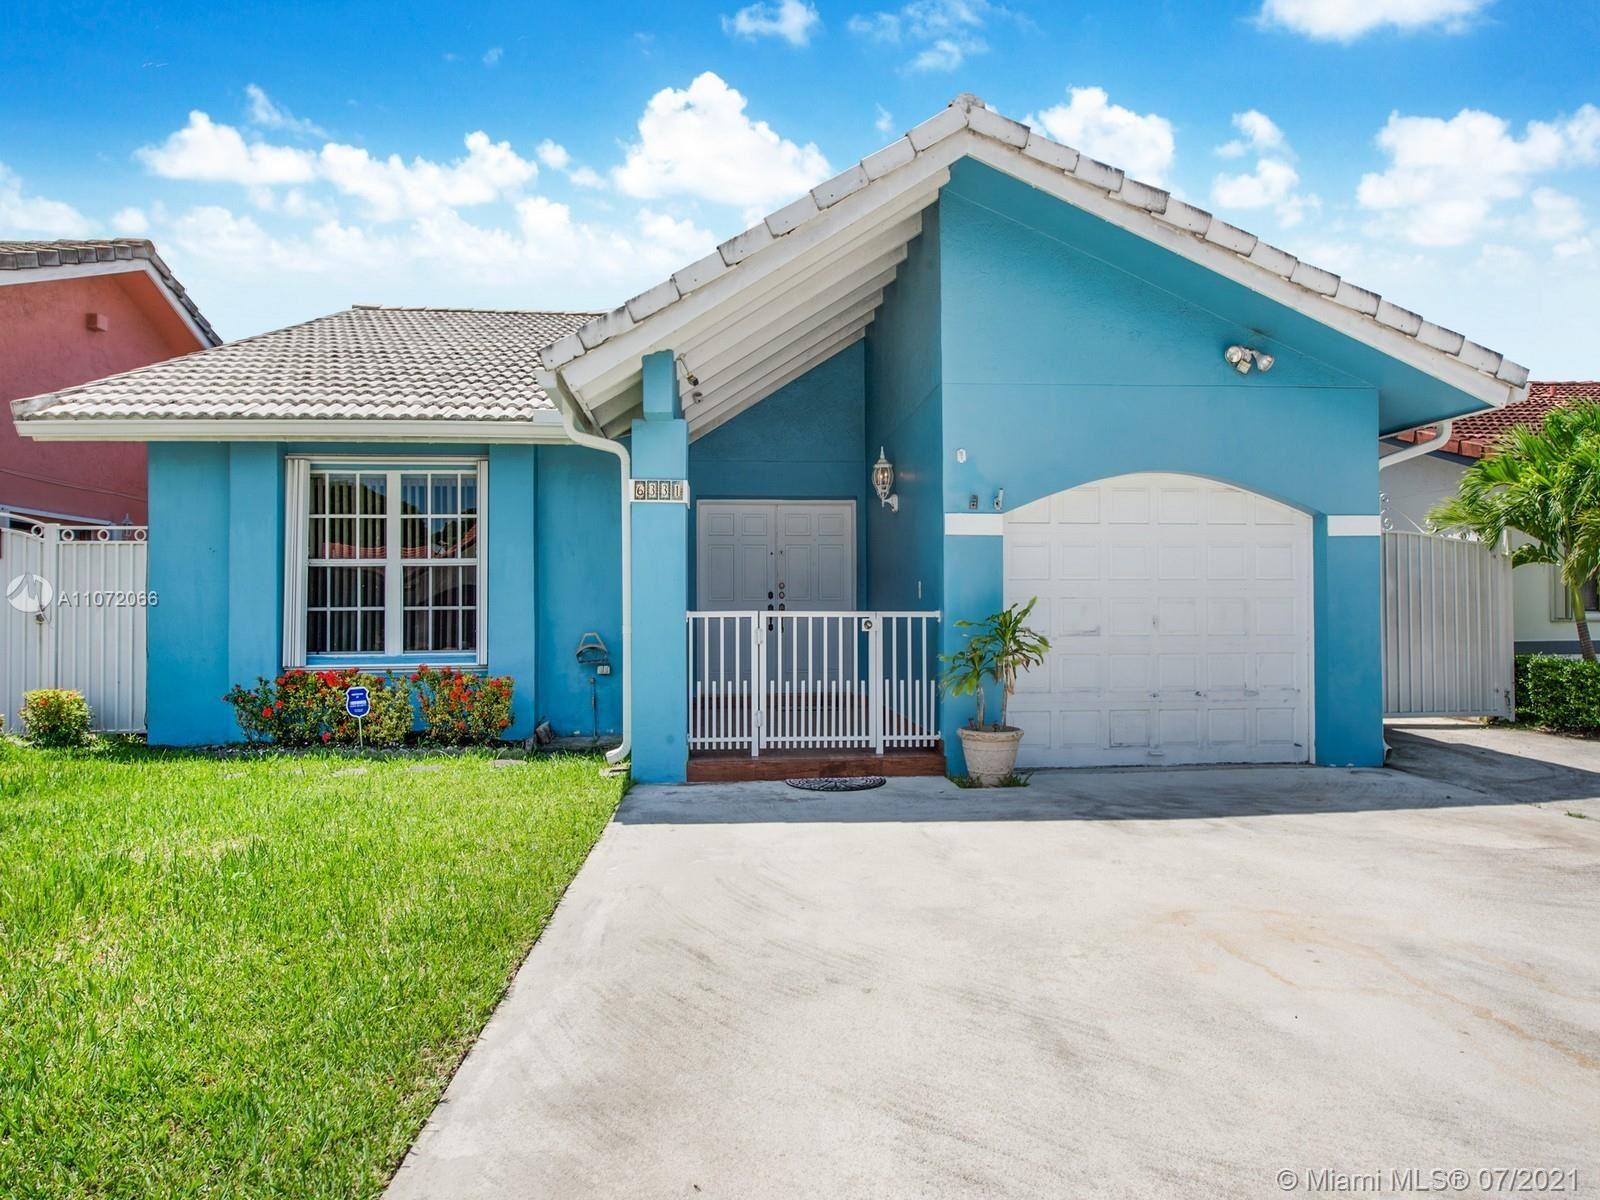 6331 SW 151st Pl, Miami, FL 33193 - #: A11072066